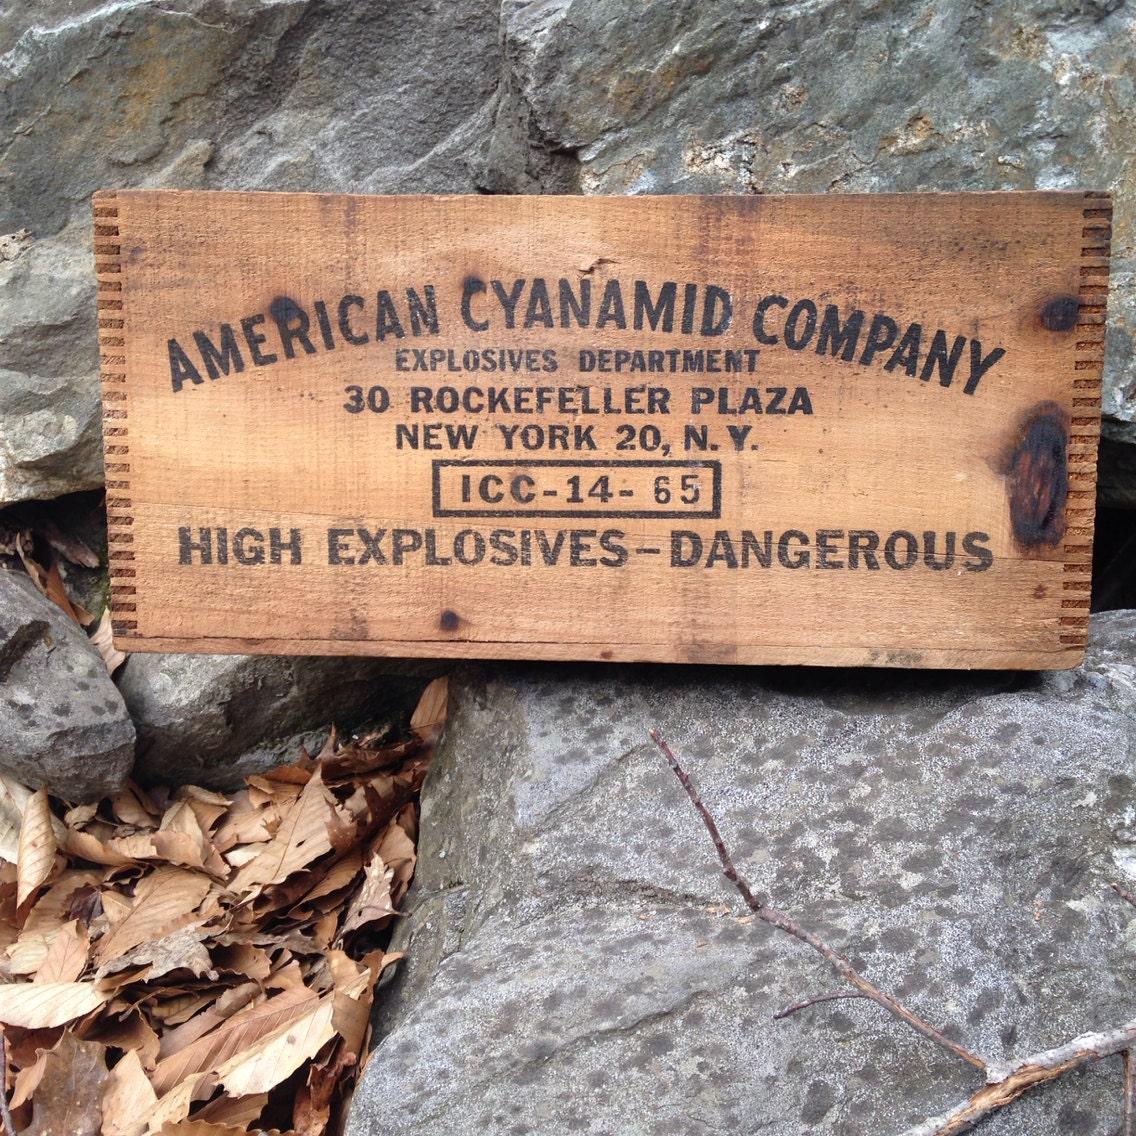 American Cyanamid Company 50lb Dynamite Explosives Crate